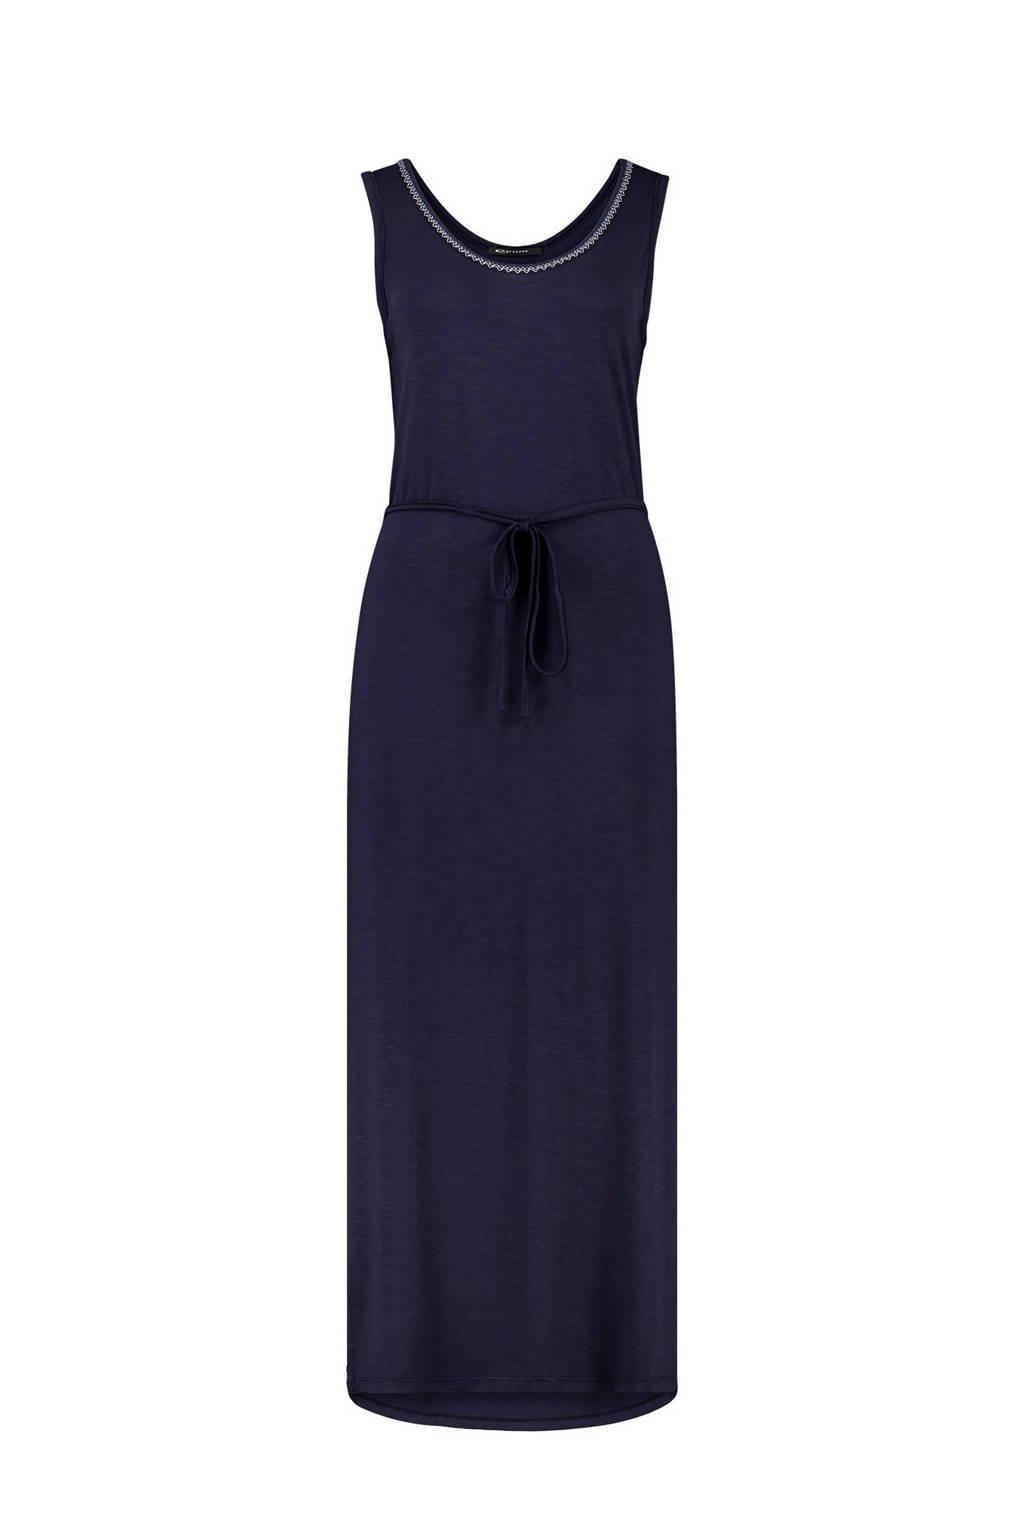 Expresso maxi jurk met contrastbies donkerblauw, Donkerblauw